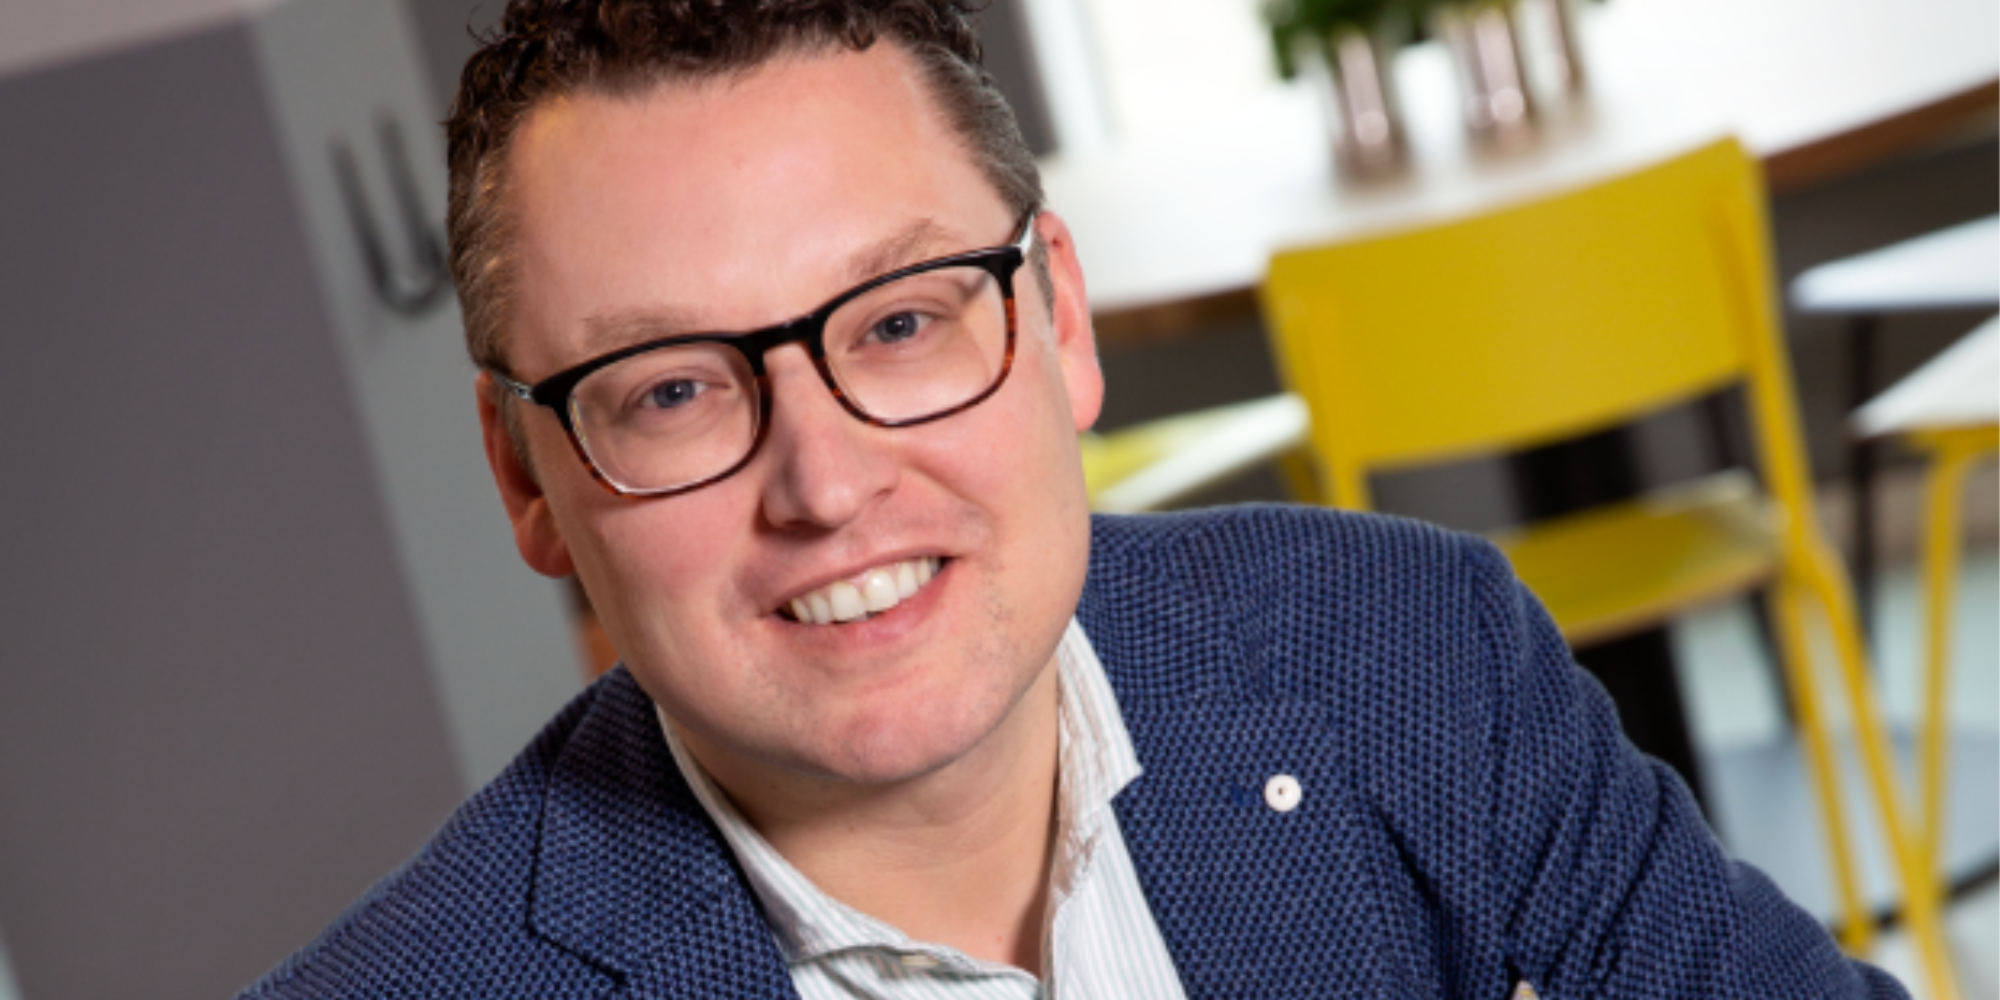 Driessen Groep: Coronakrant.nl voor werkgevers